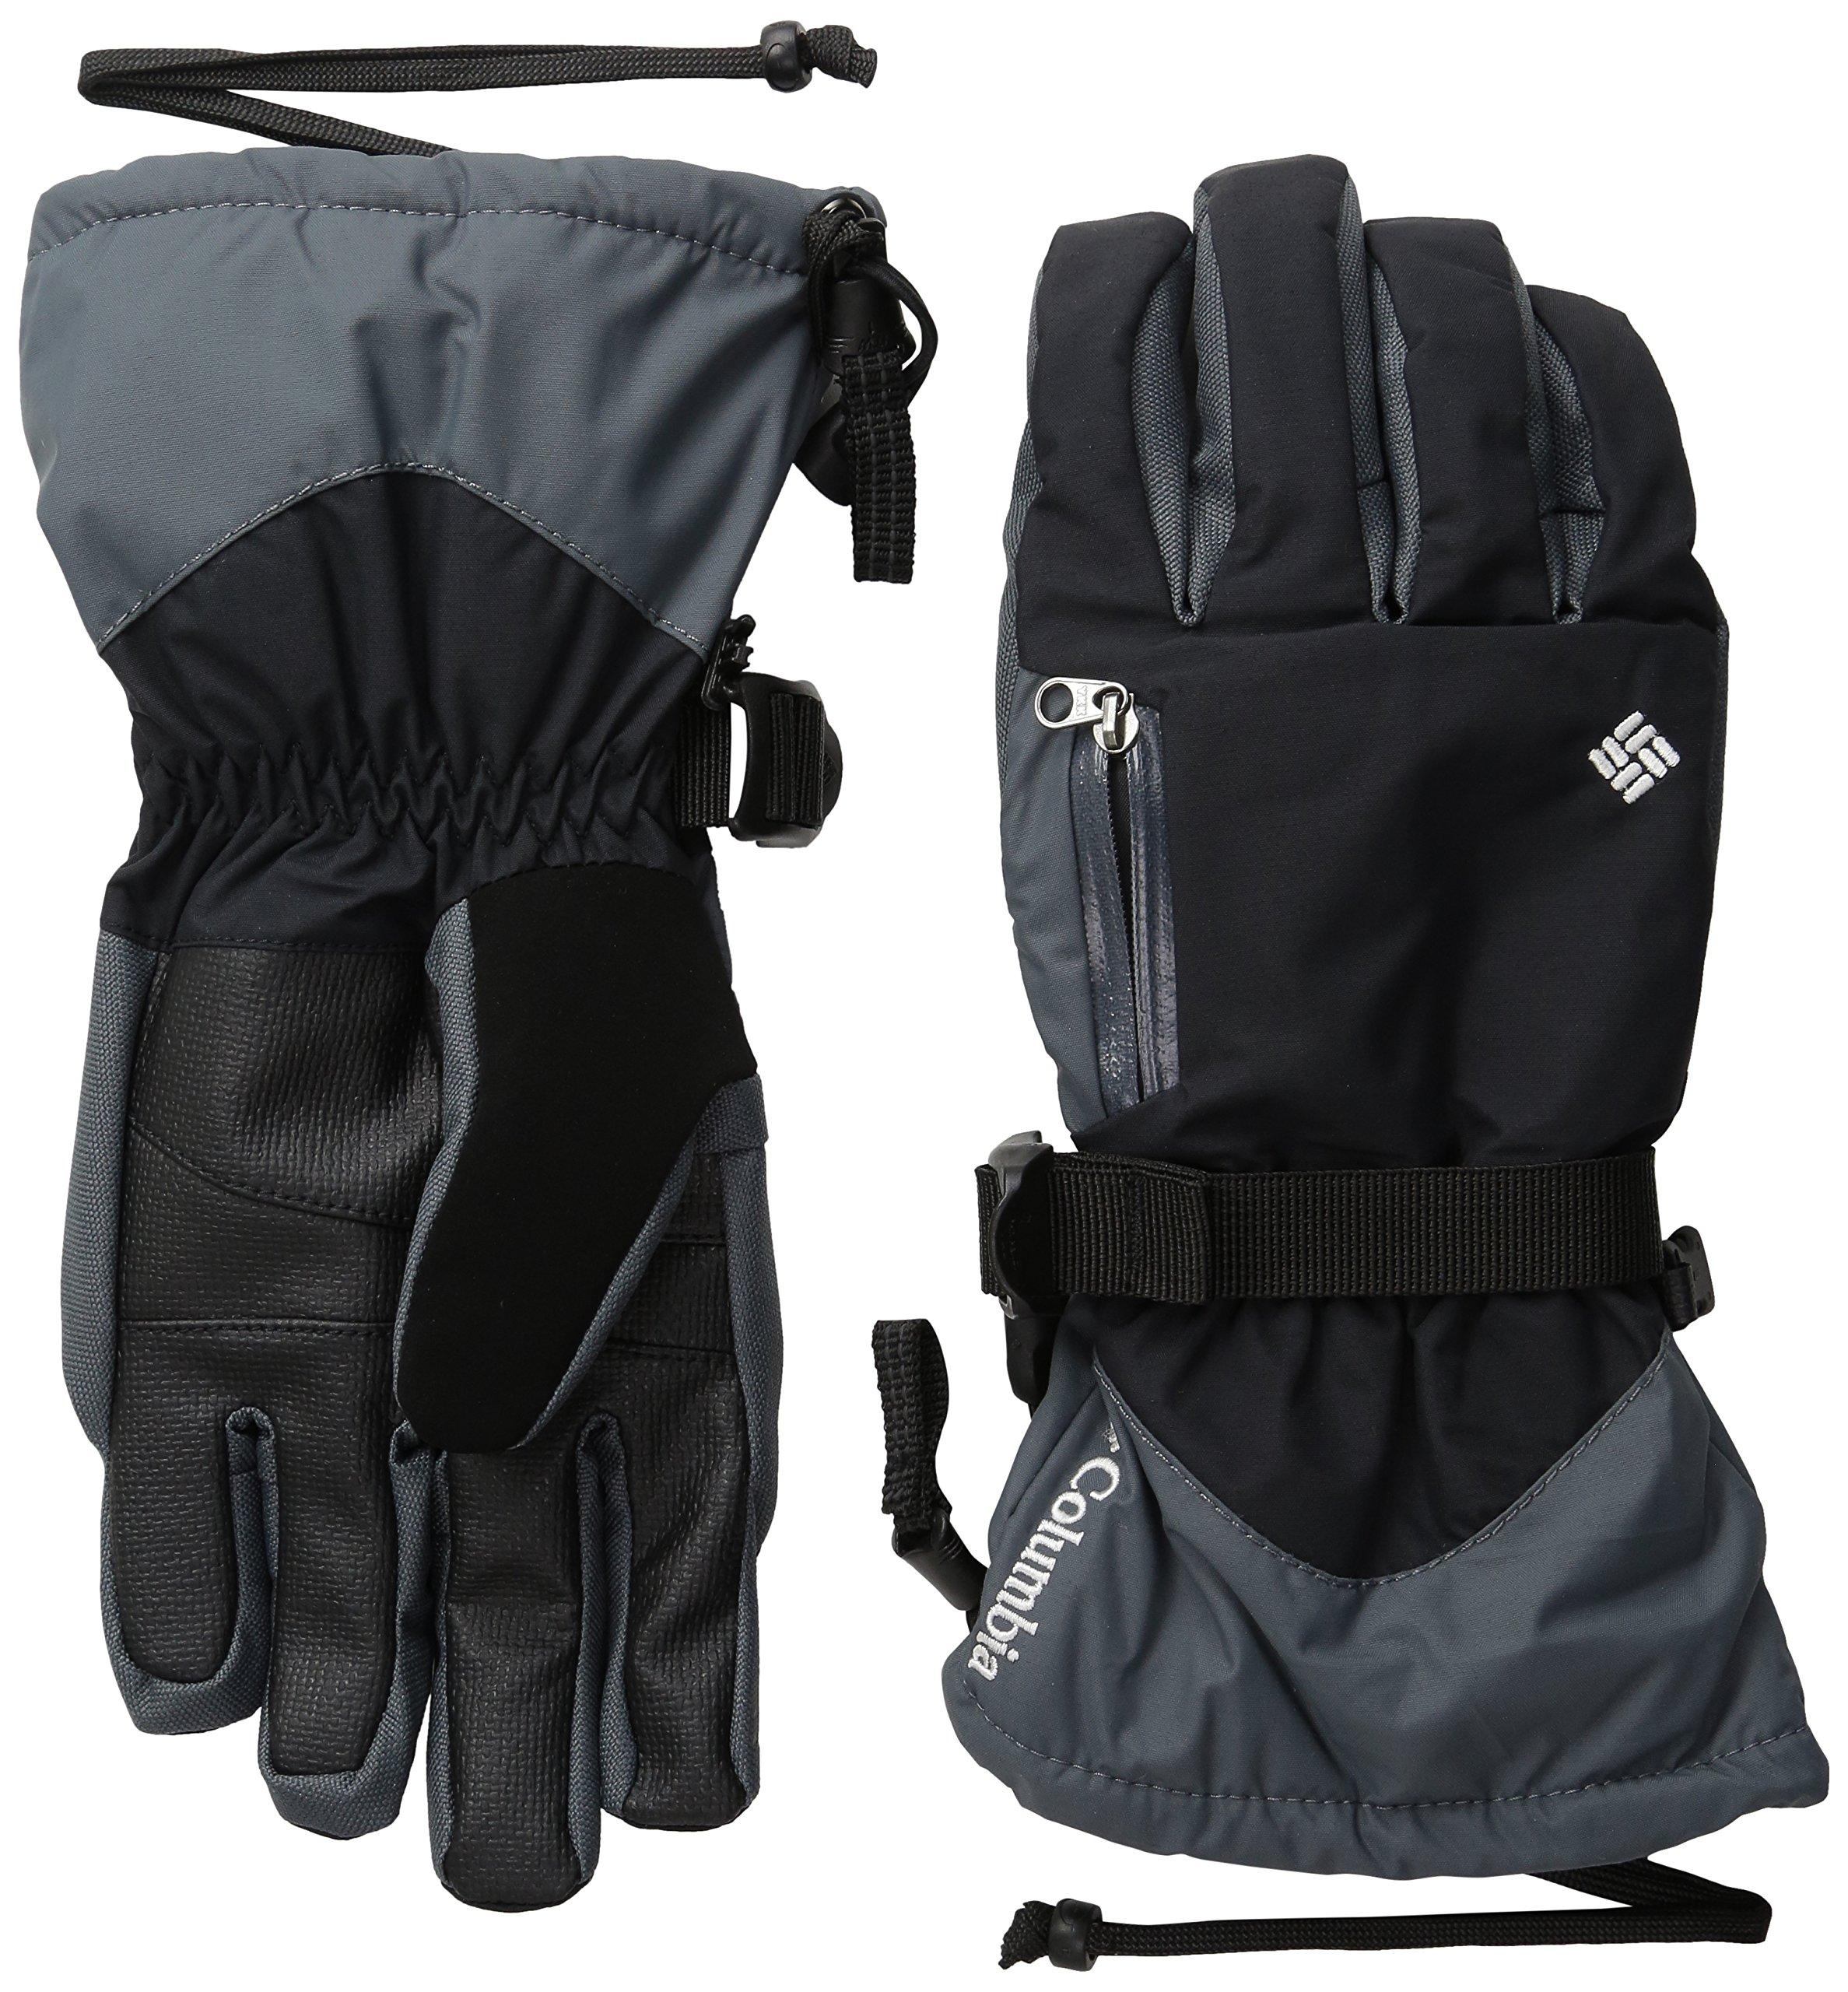 Columbia Women's Bugaboo Interchange Gloves, Black/White, Medium by Columbia